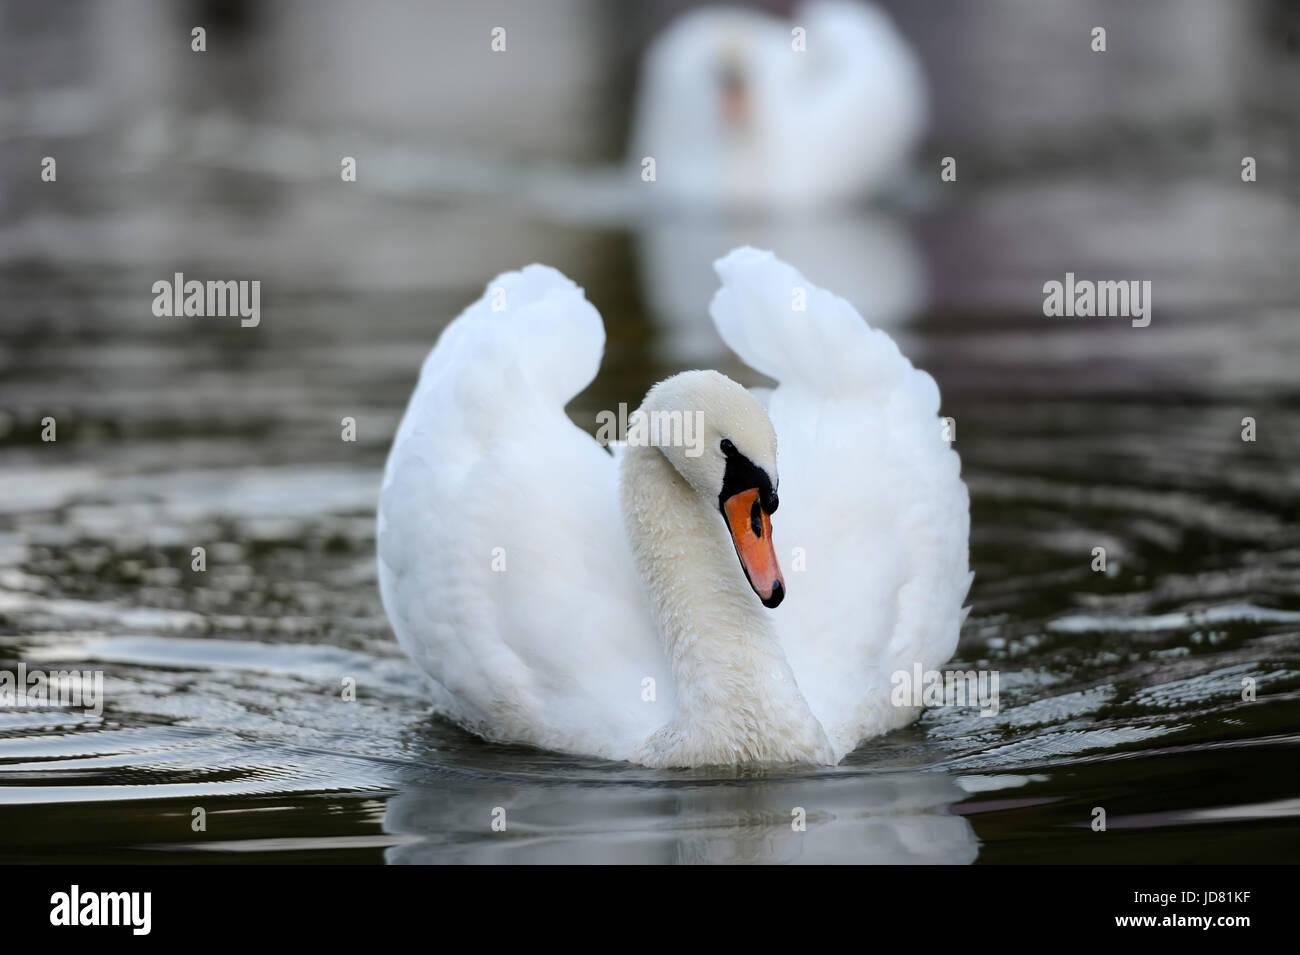 Close beautiful swan swimming in the lake - Stock Image